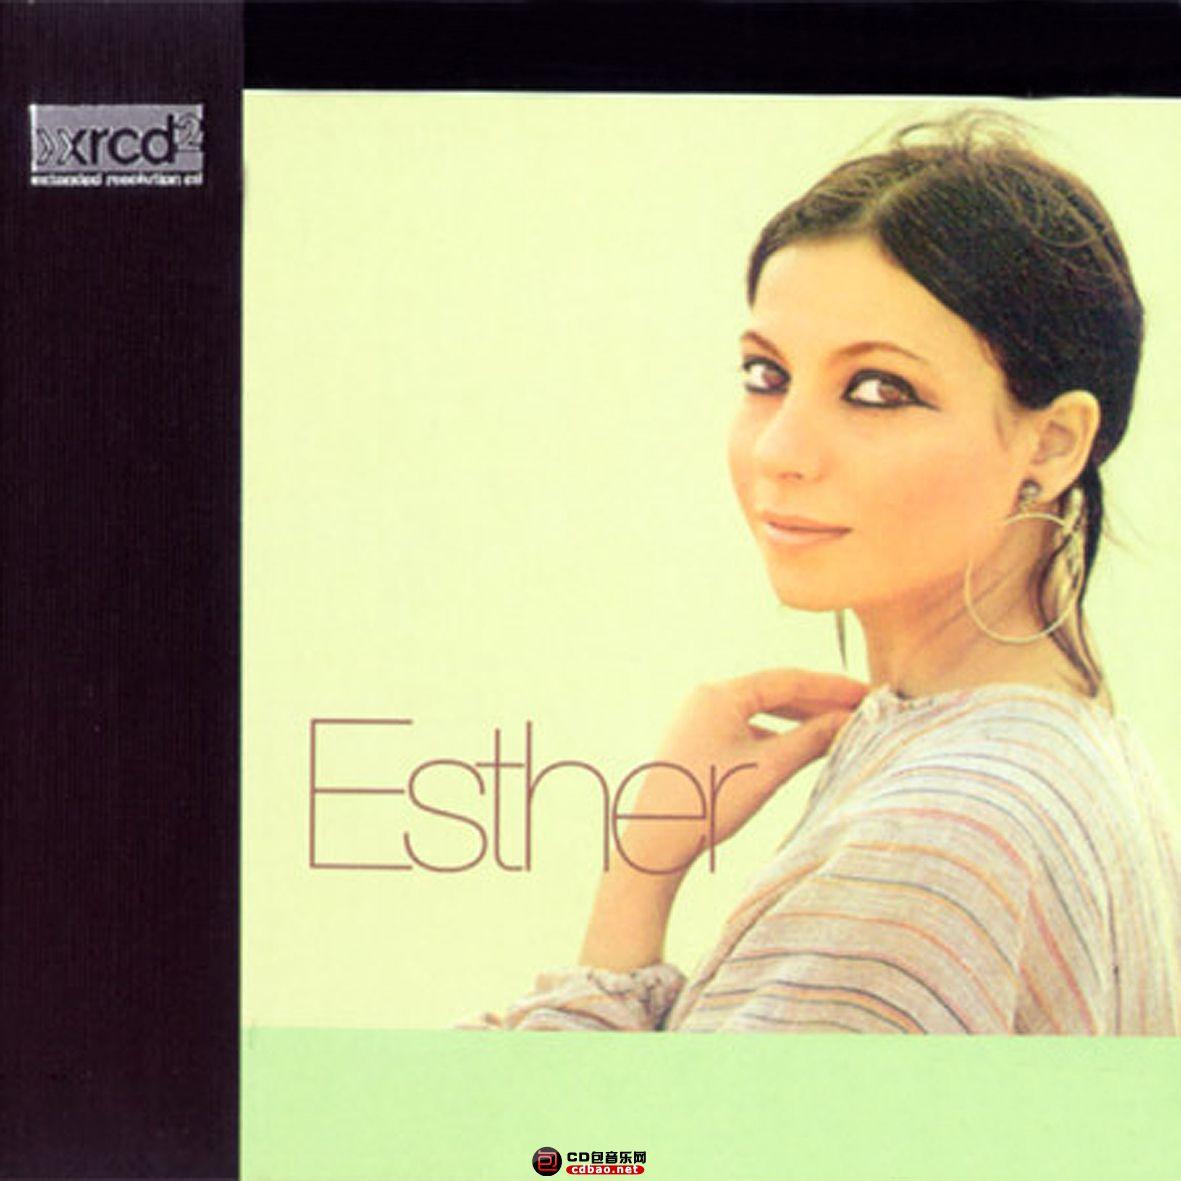 Esther_02.jpg